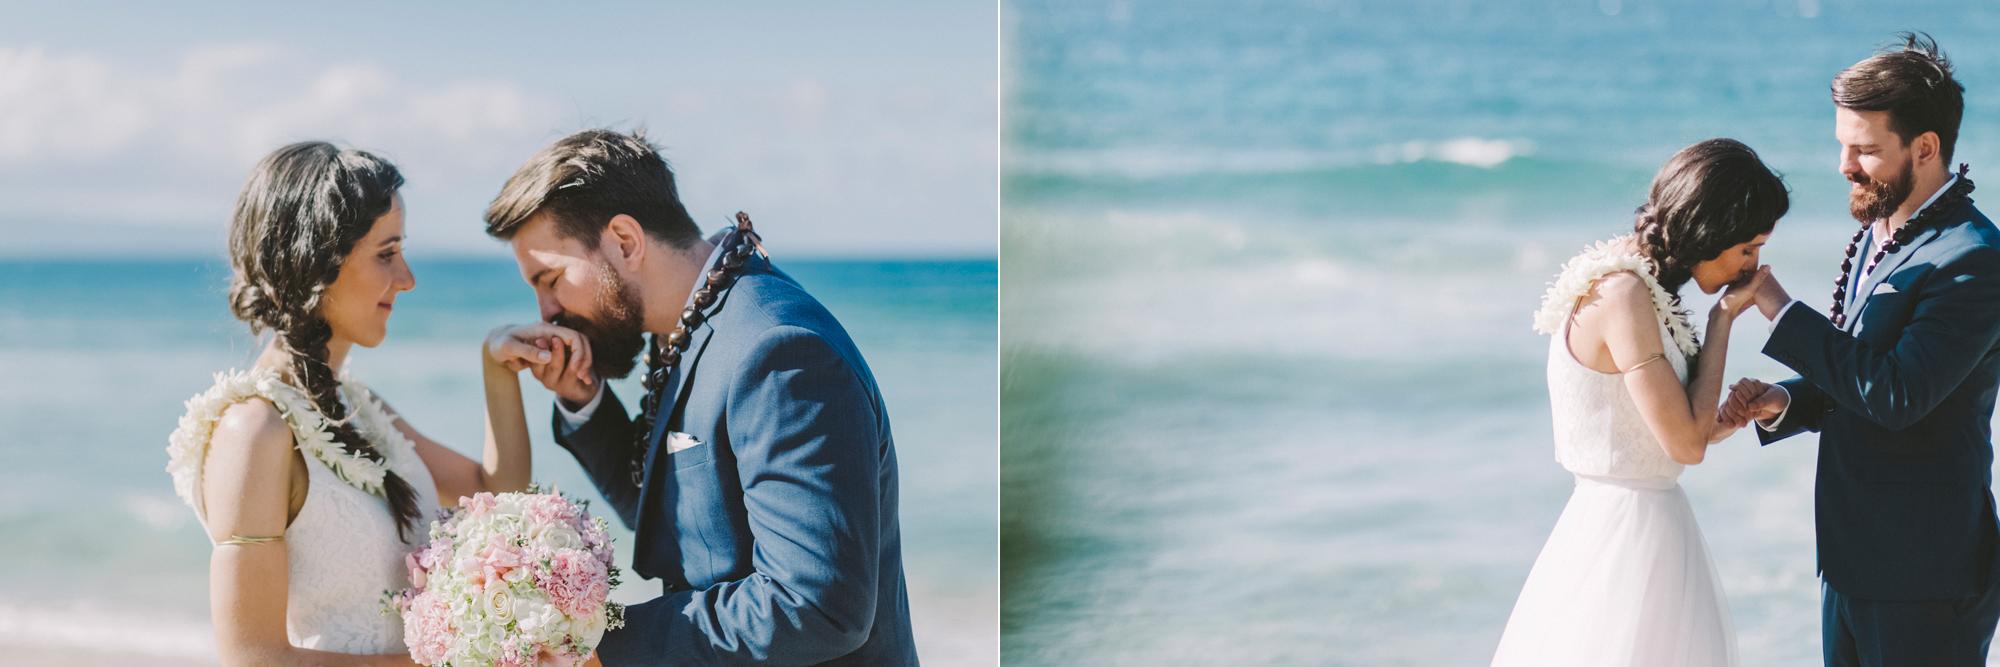 angie-diaz-photography-maui-wedding-ironwoods-beach-17.jpg